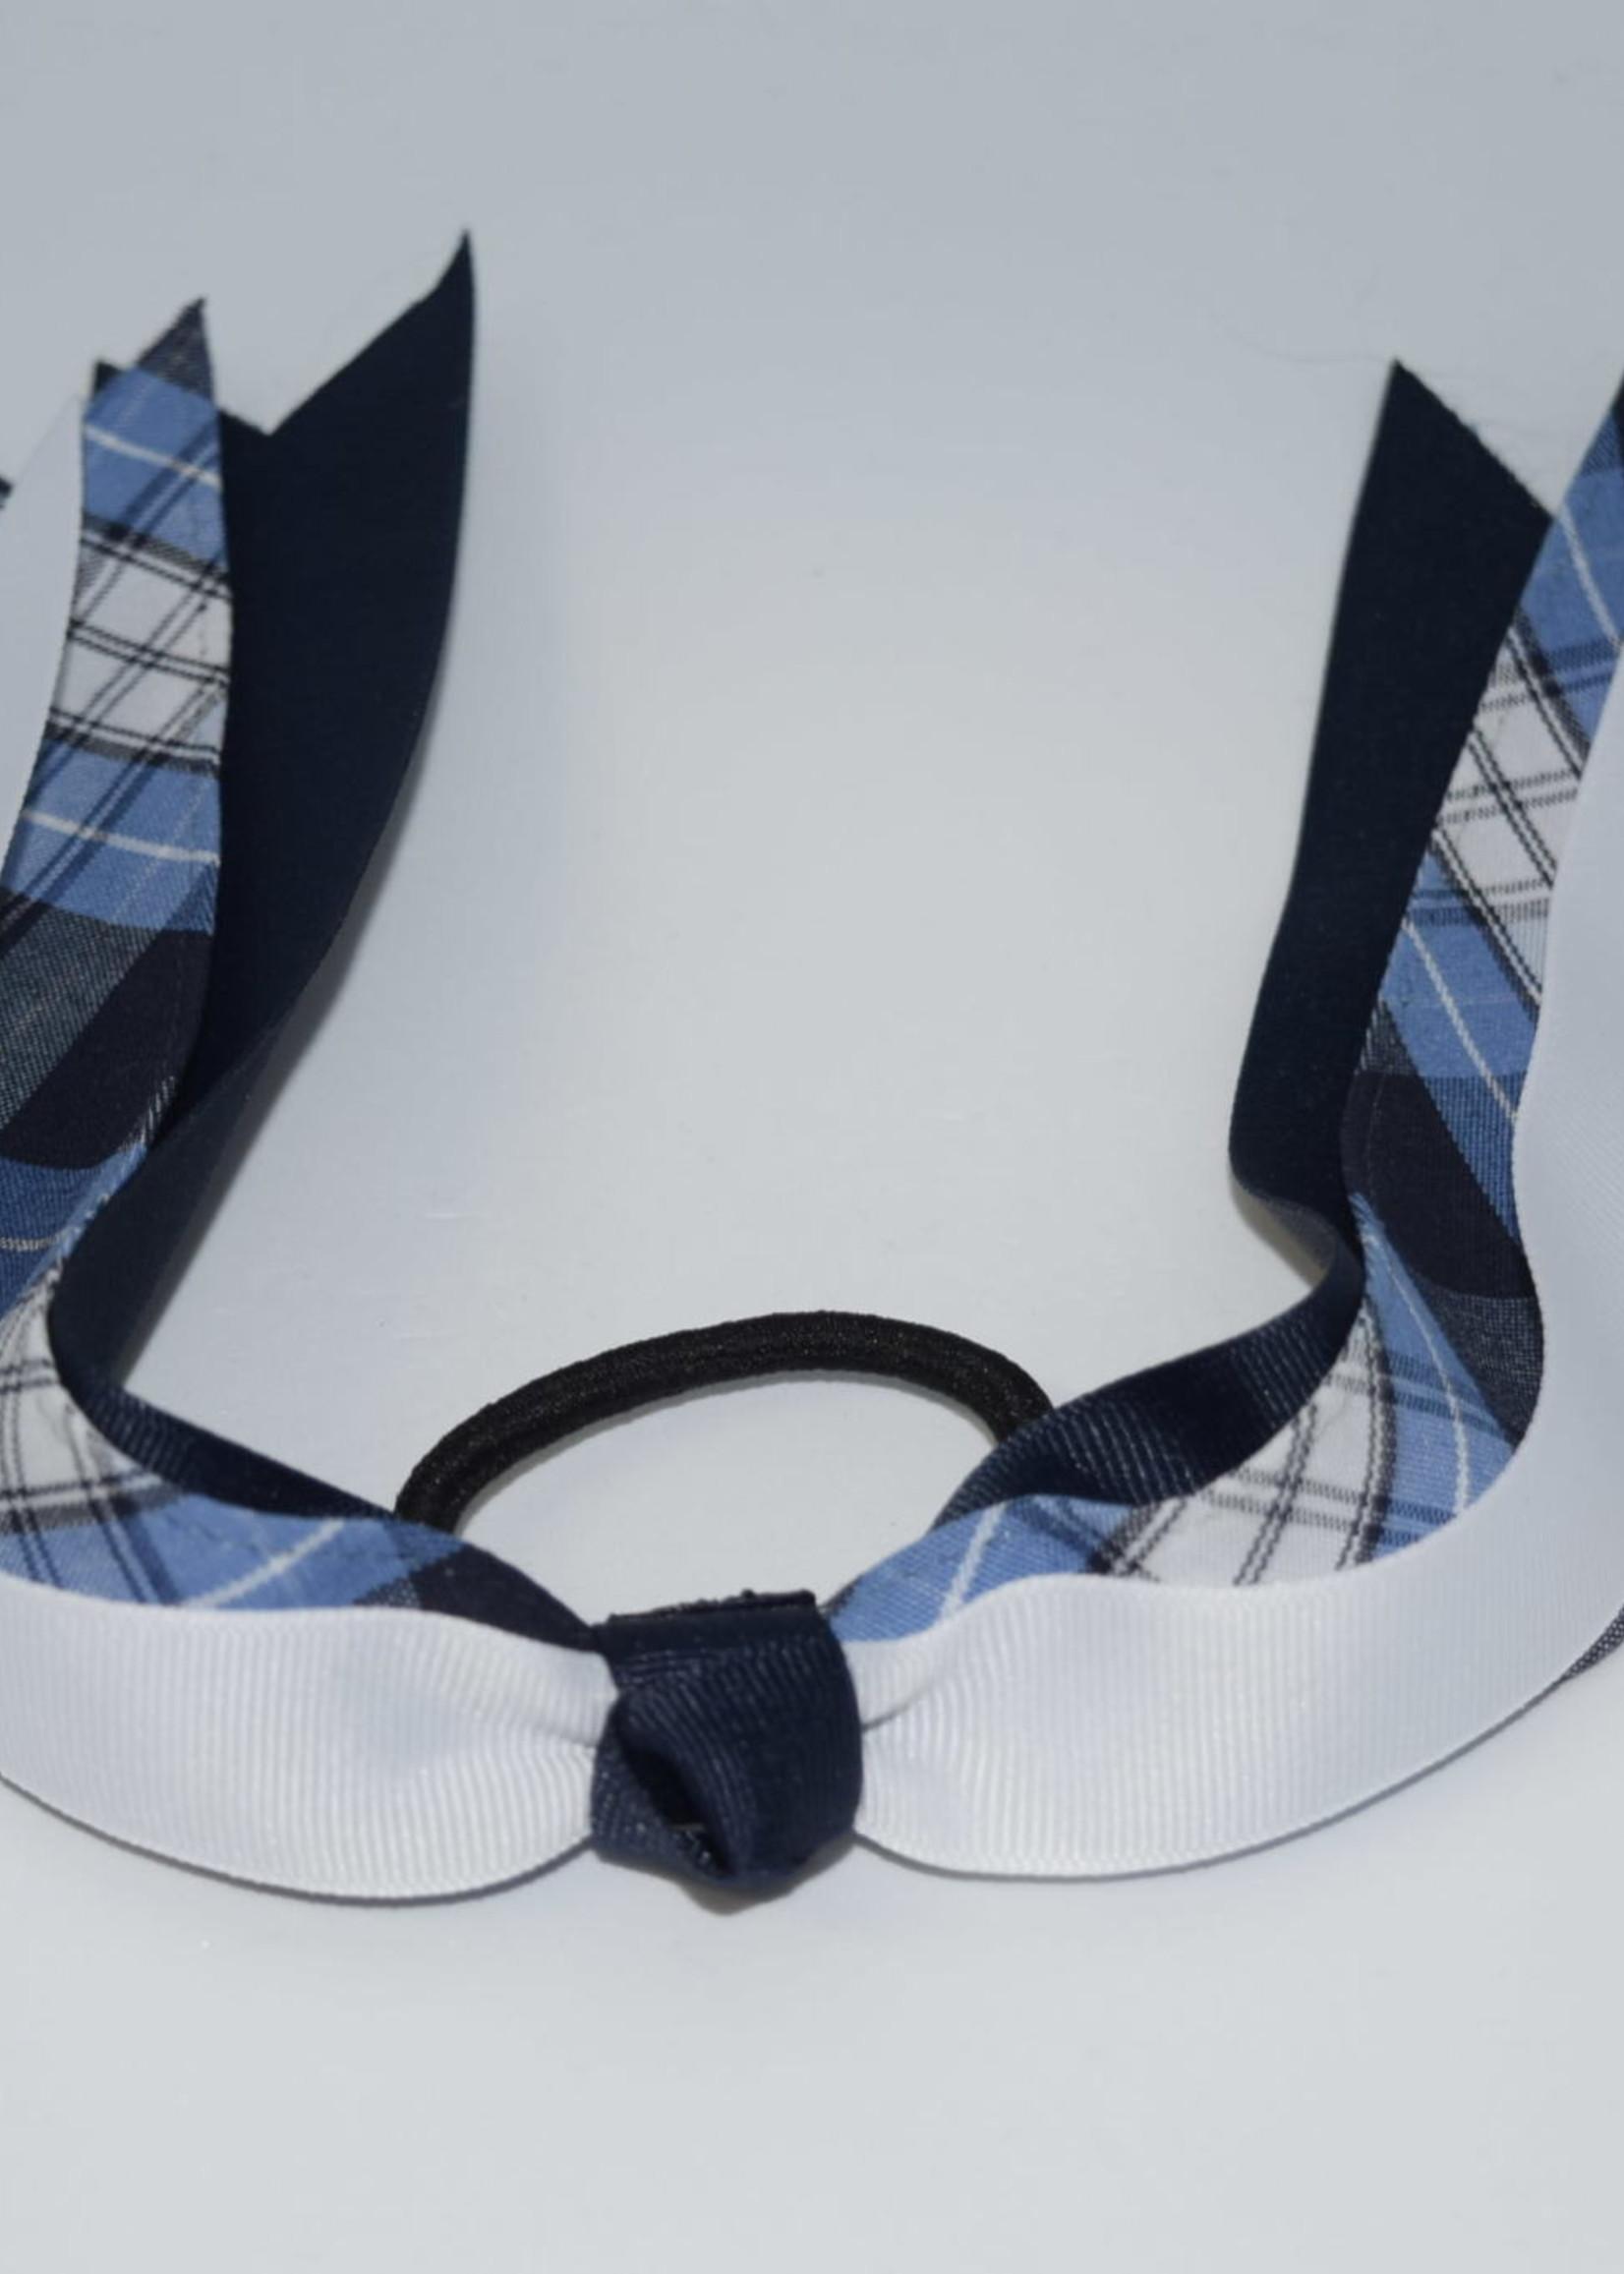 Wide Plaid & Grosgrain Ribbon Streamer Bow P76 NVY WHT